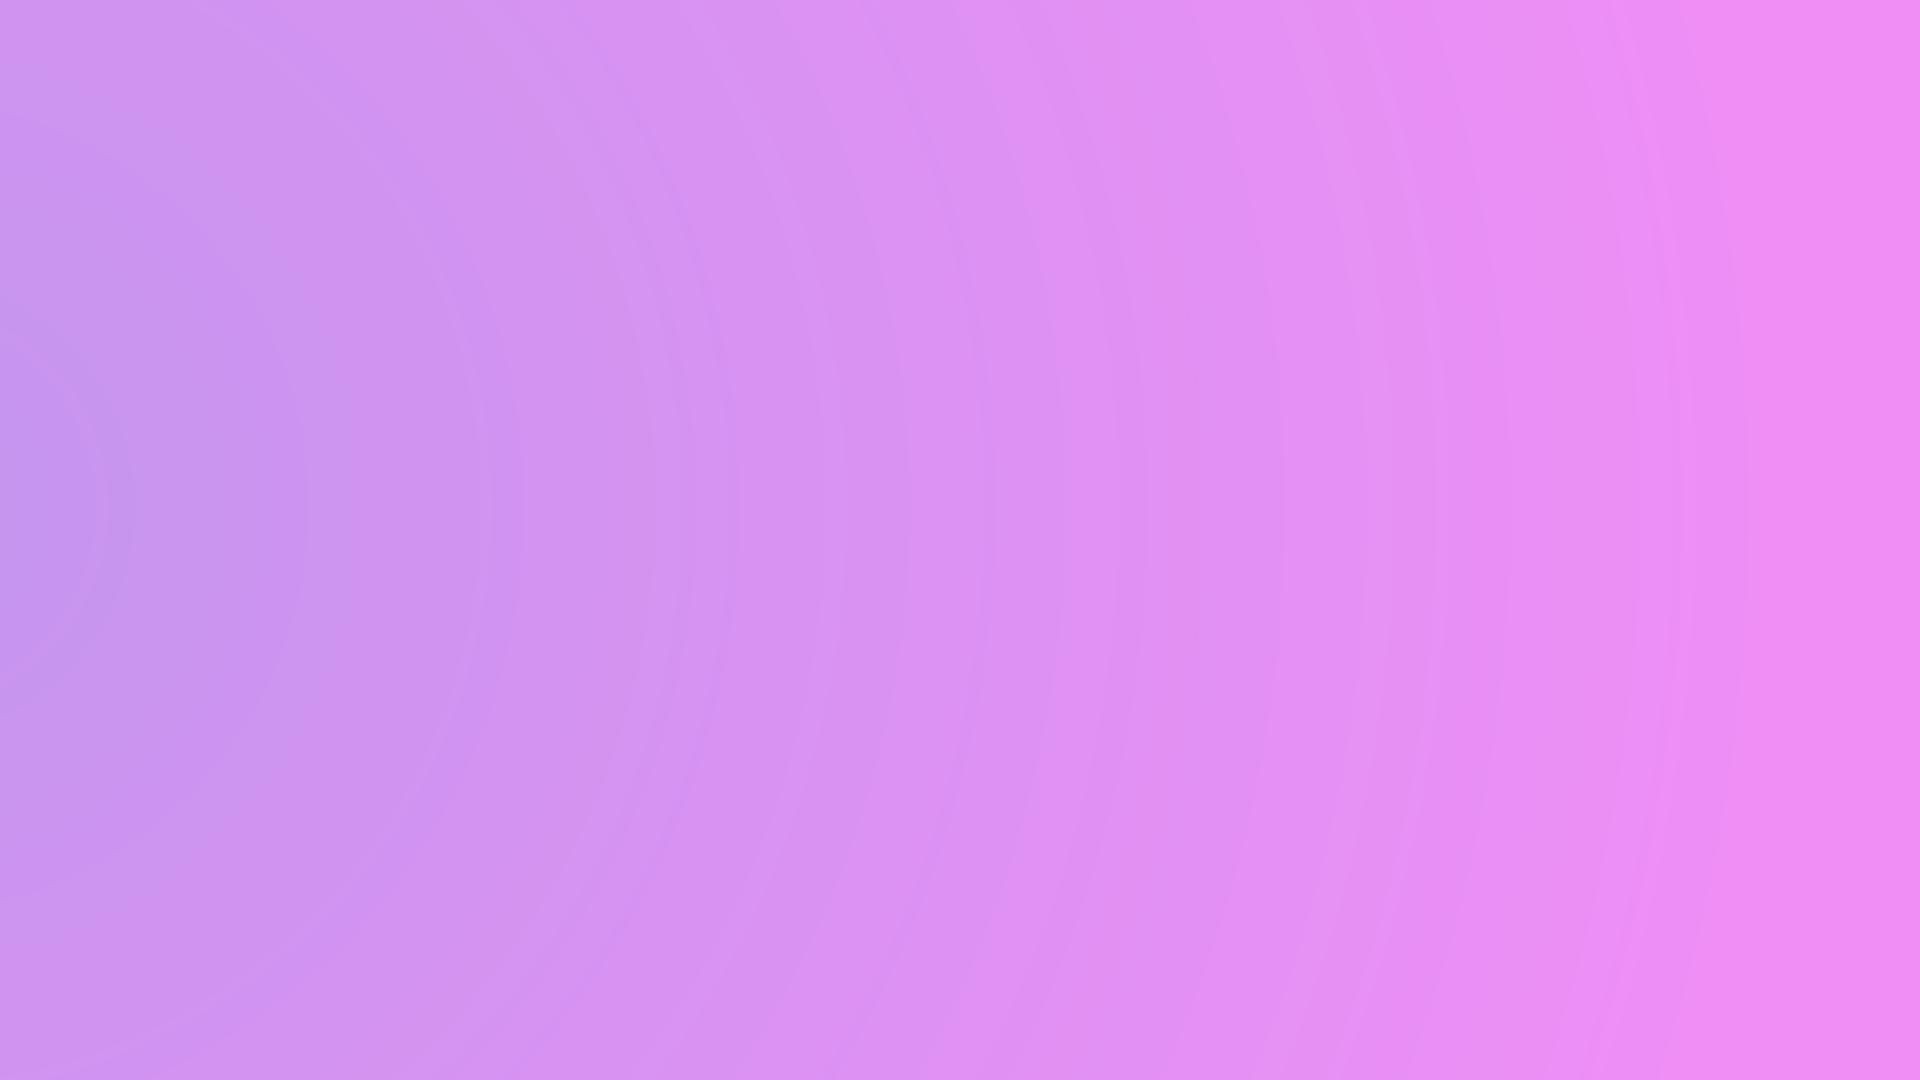 Lavender-Pink Gradient